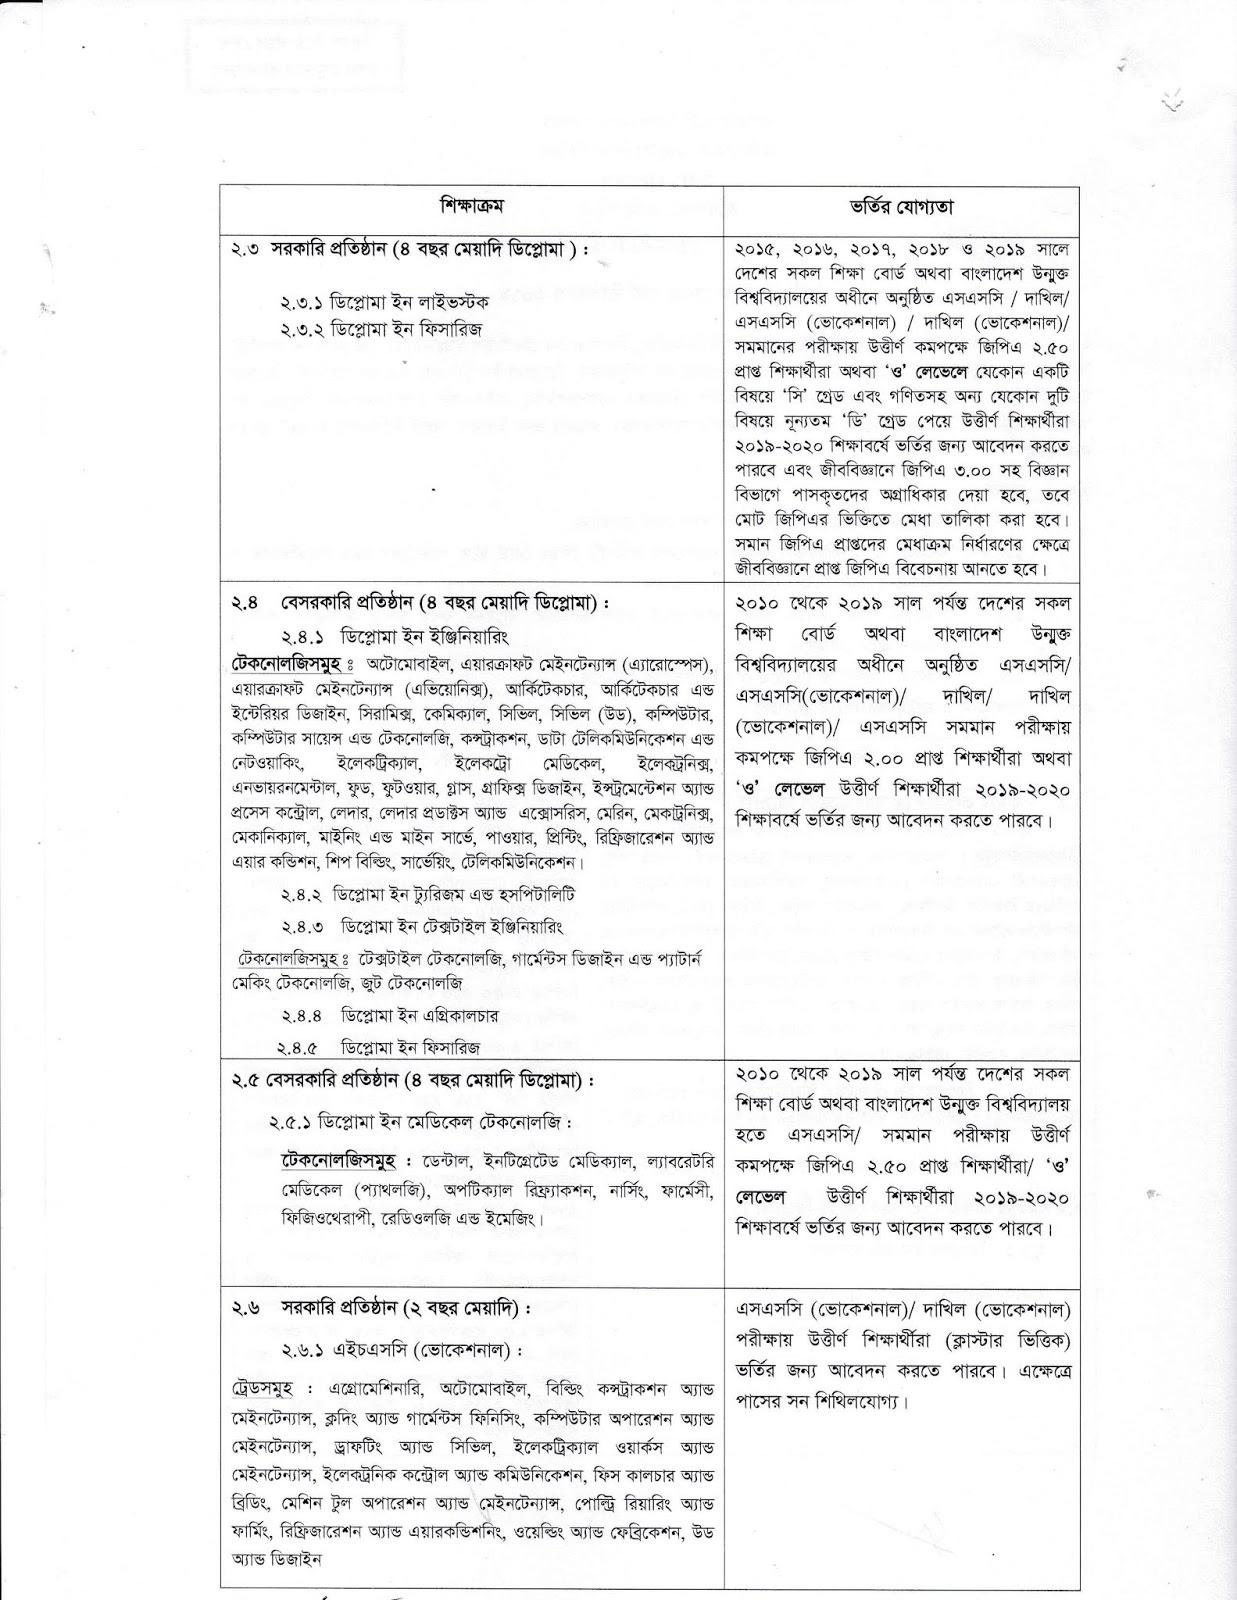 BTEB Polytechnic diploma Engineering Admission 2019-2020 Notice